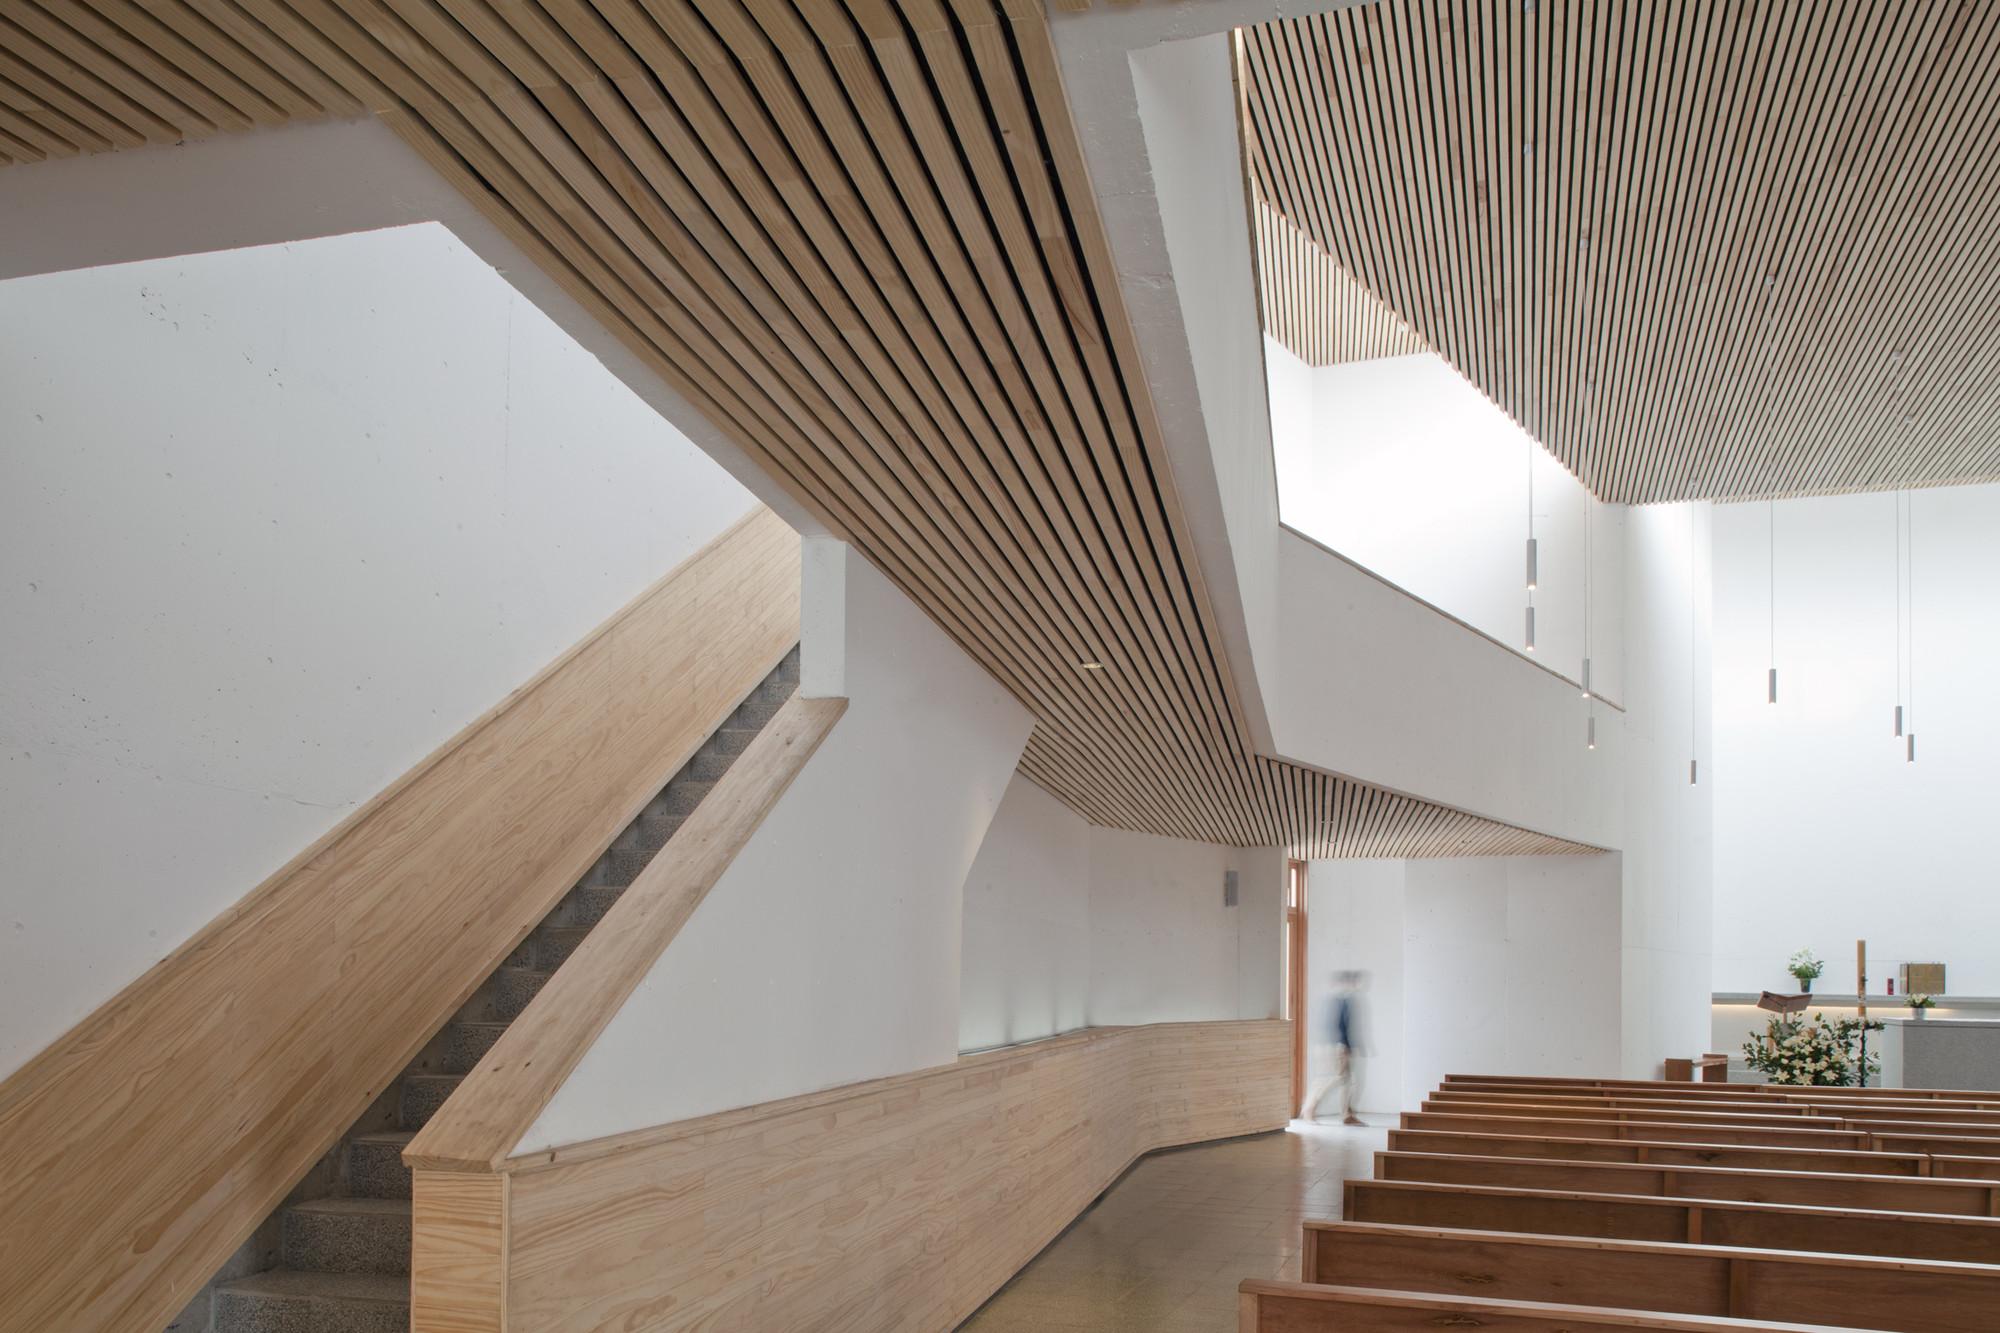 Tomas Browne Tag Plataforma Arquitectura # Fabrica De Muebles Pudahuel